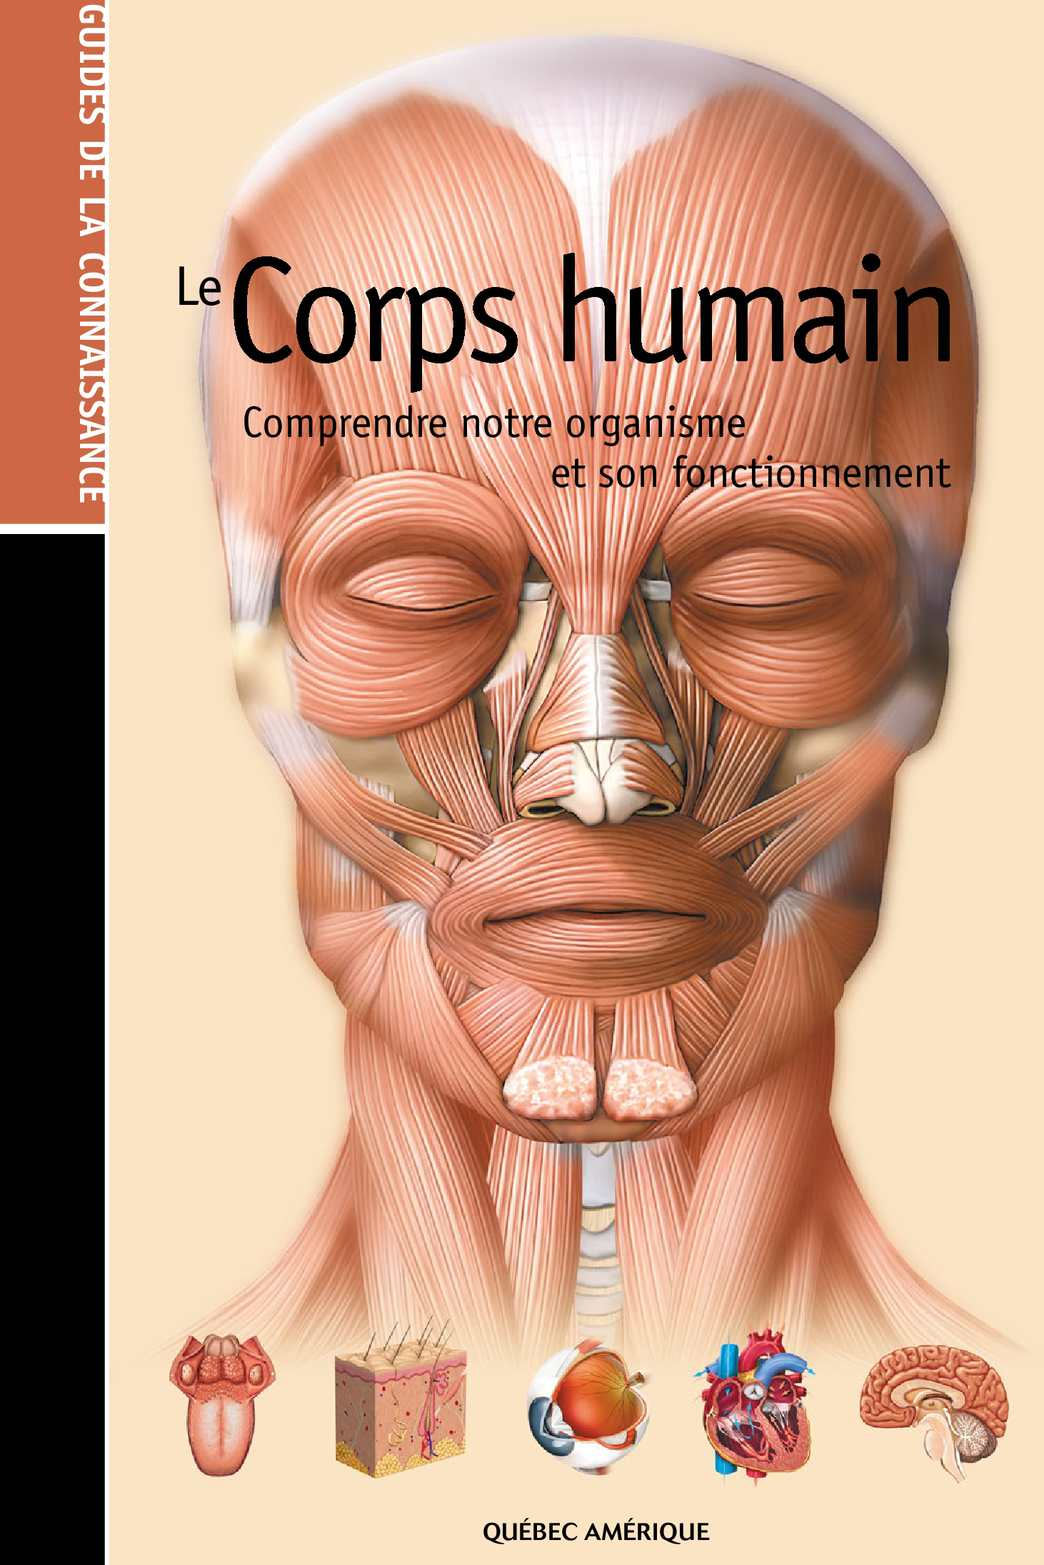 Le Corps Humain - Comprendre notre organisme